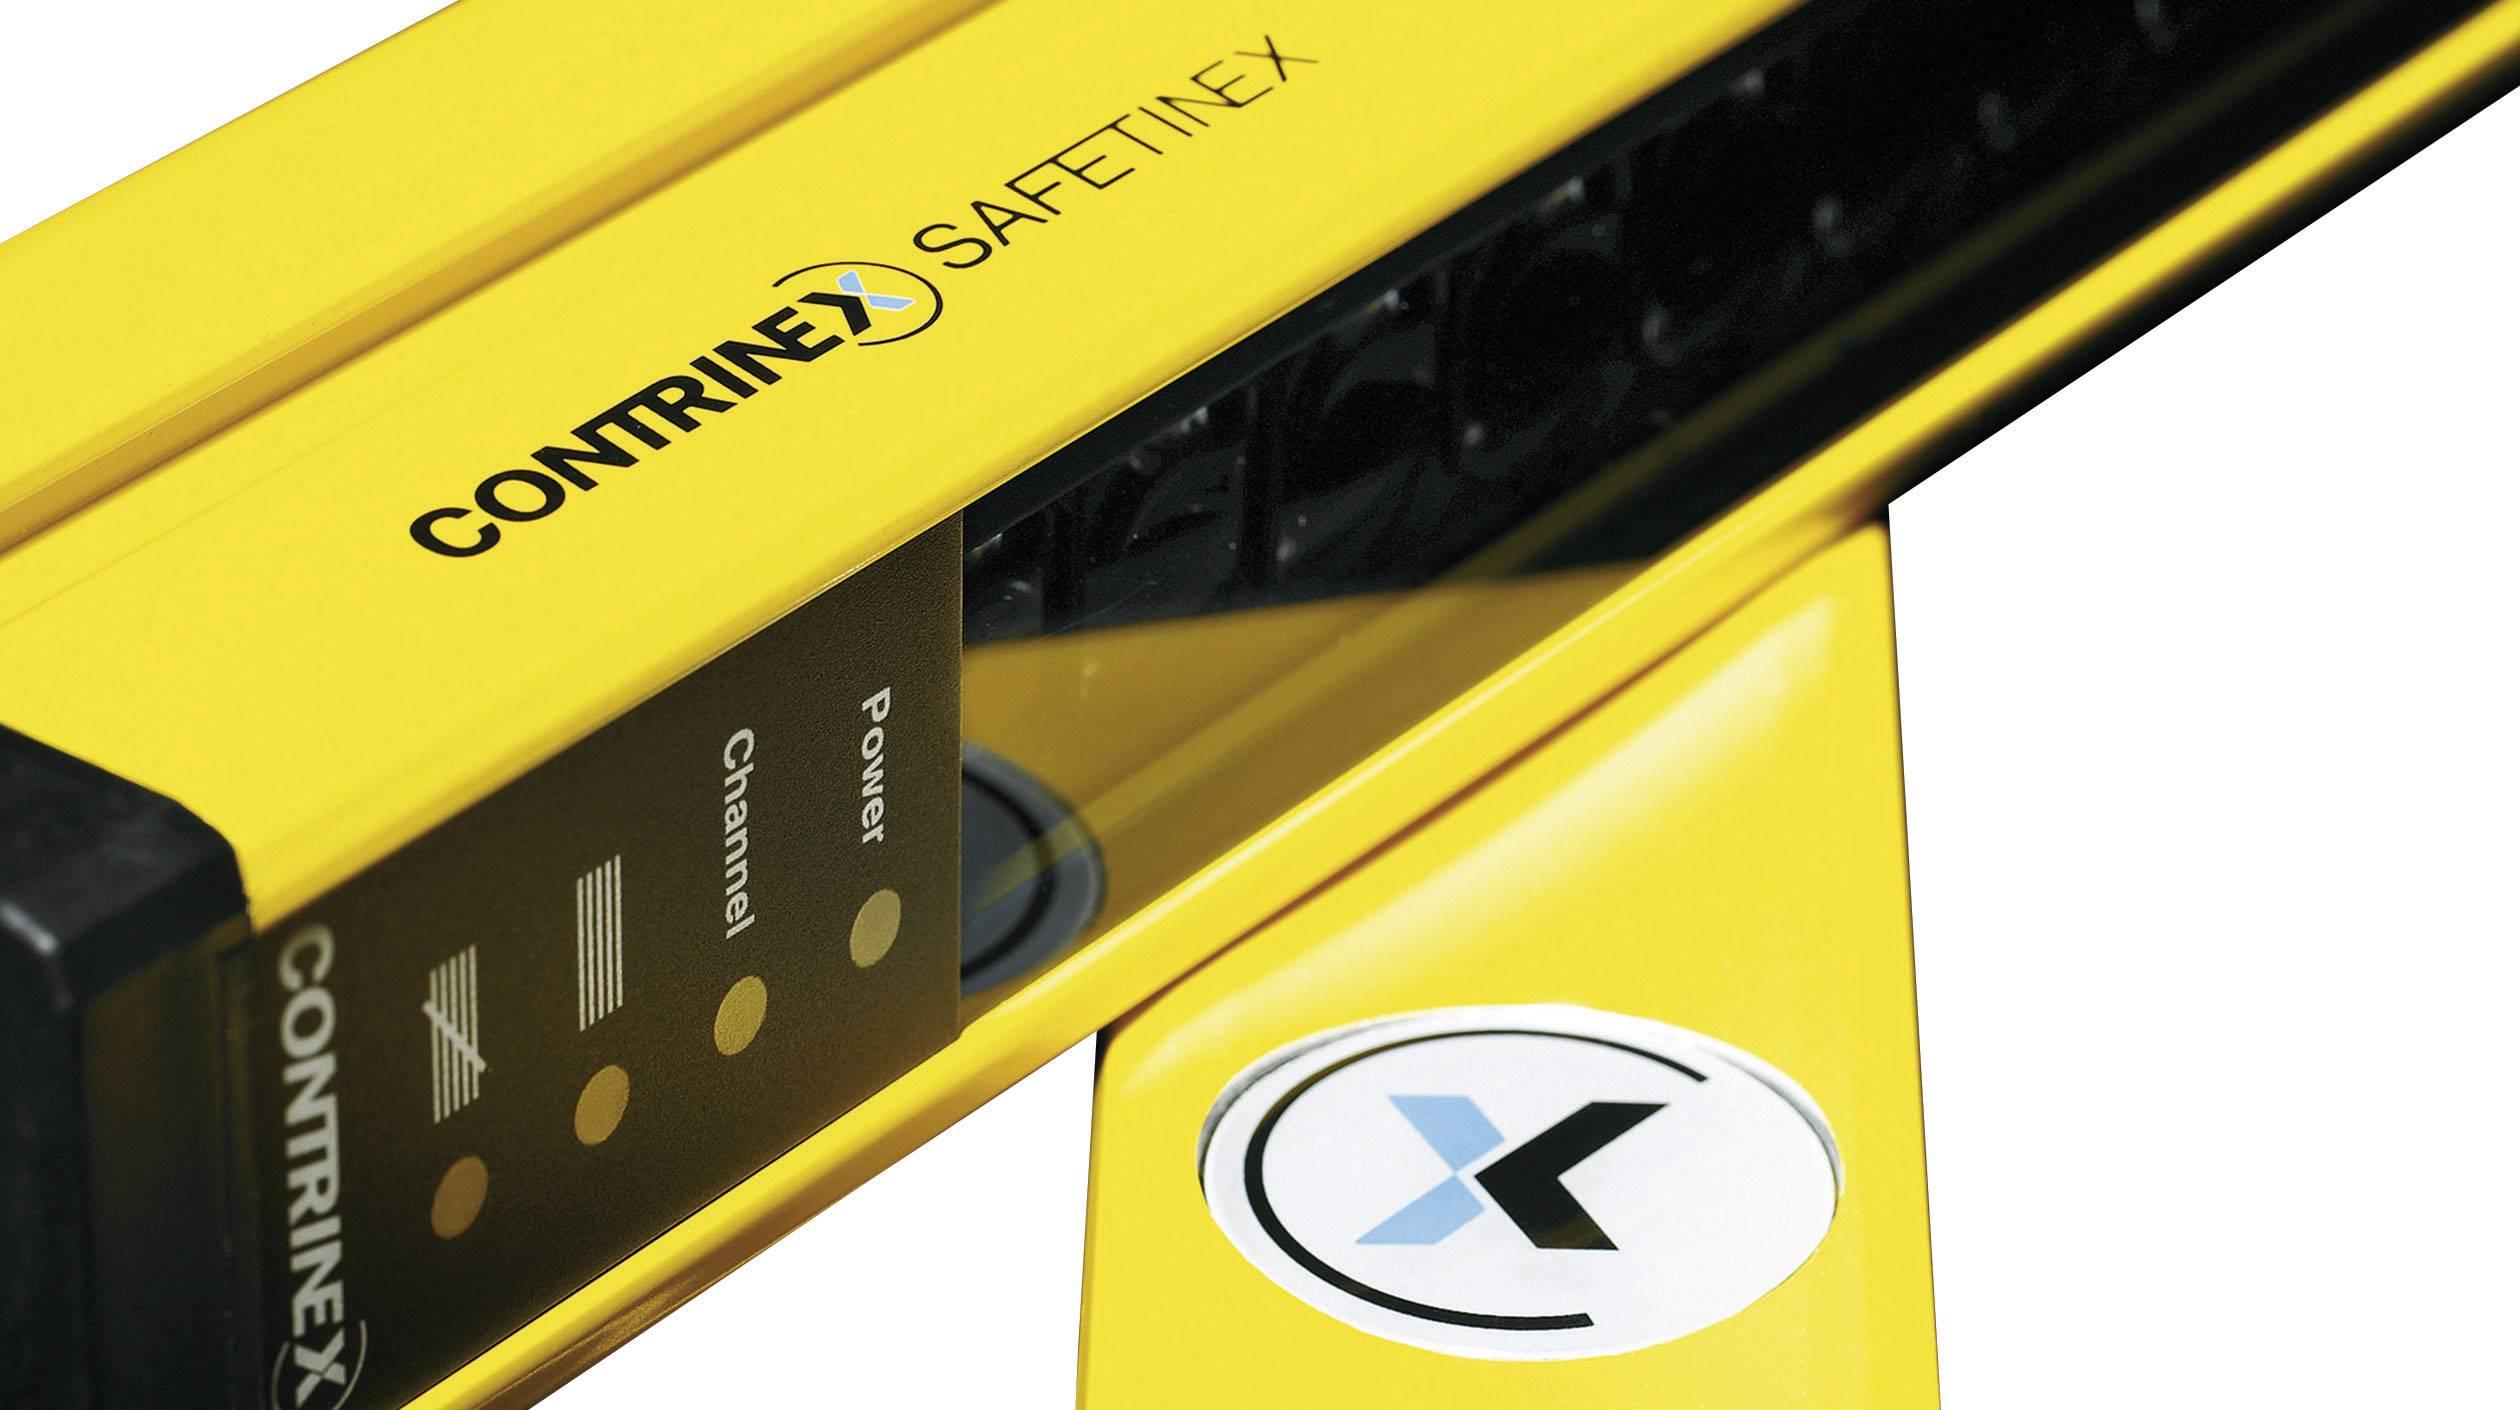 Contrinex YBB-30R4-1400-G012 630 000 691